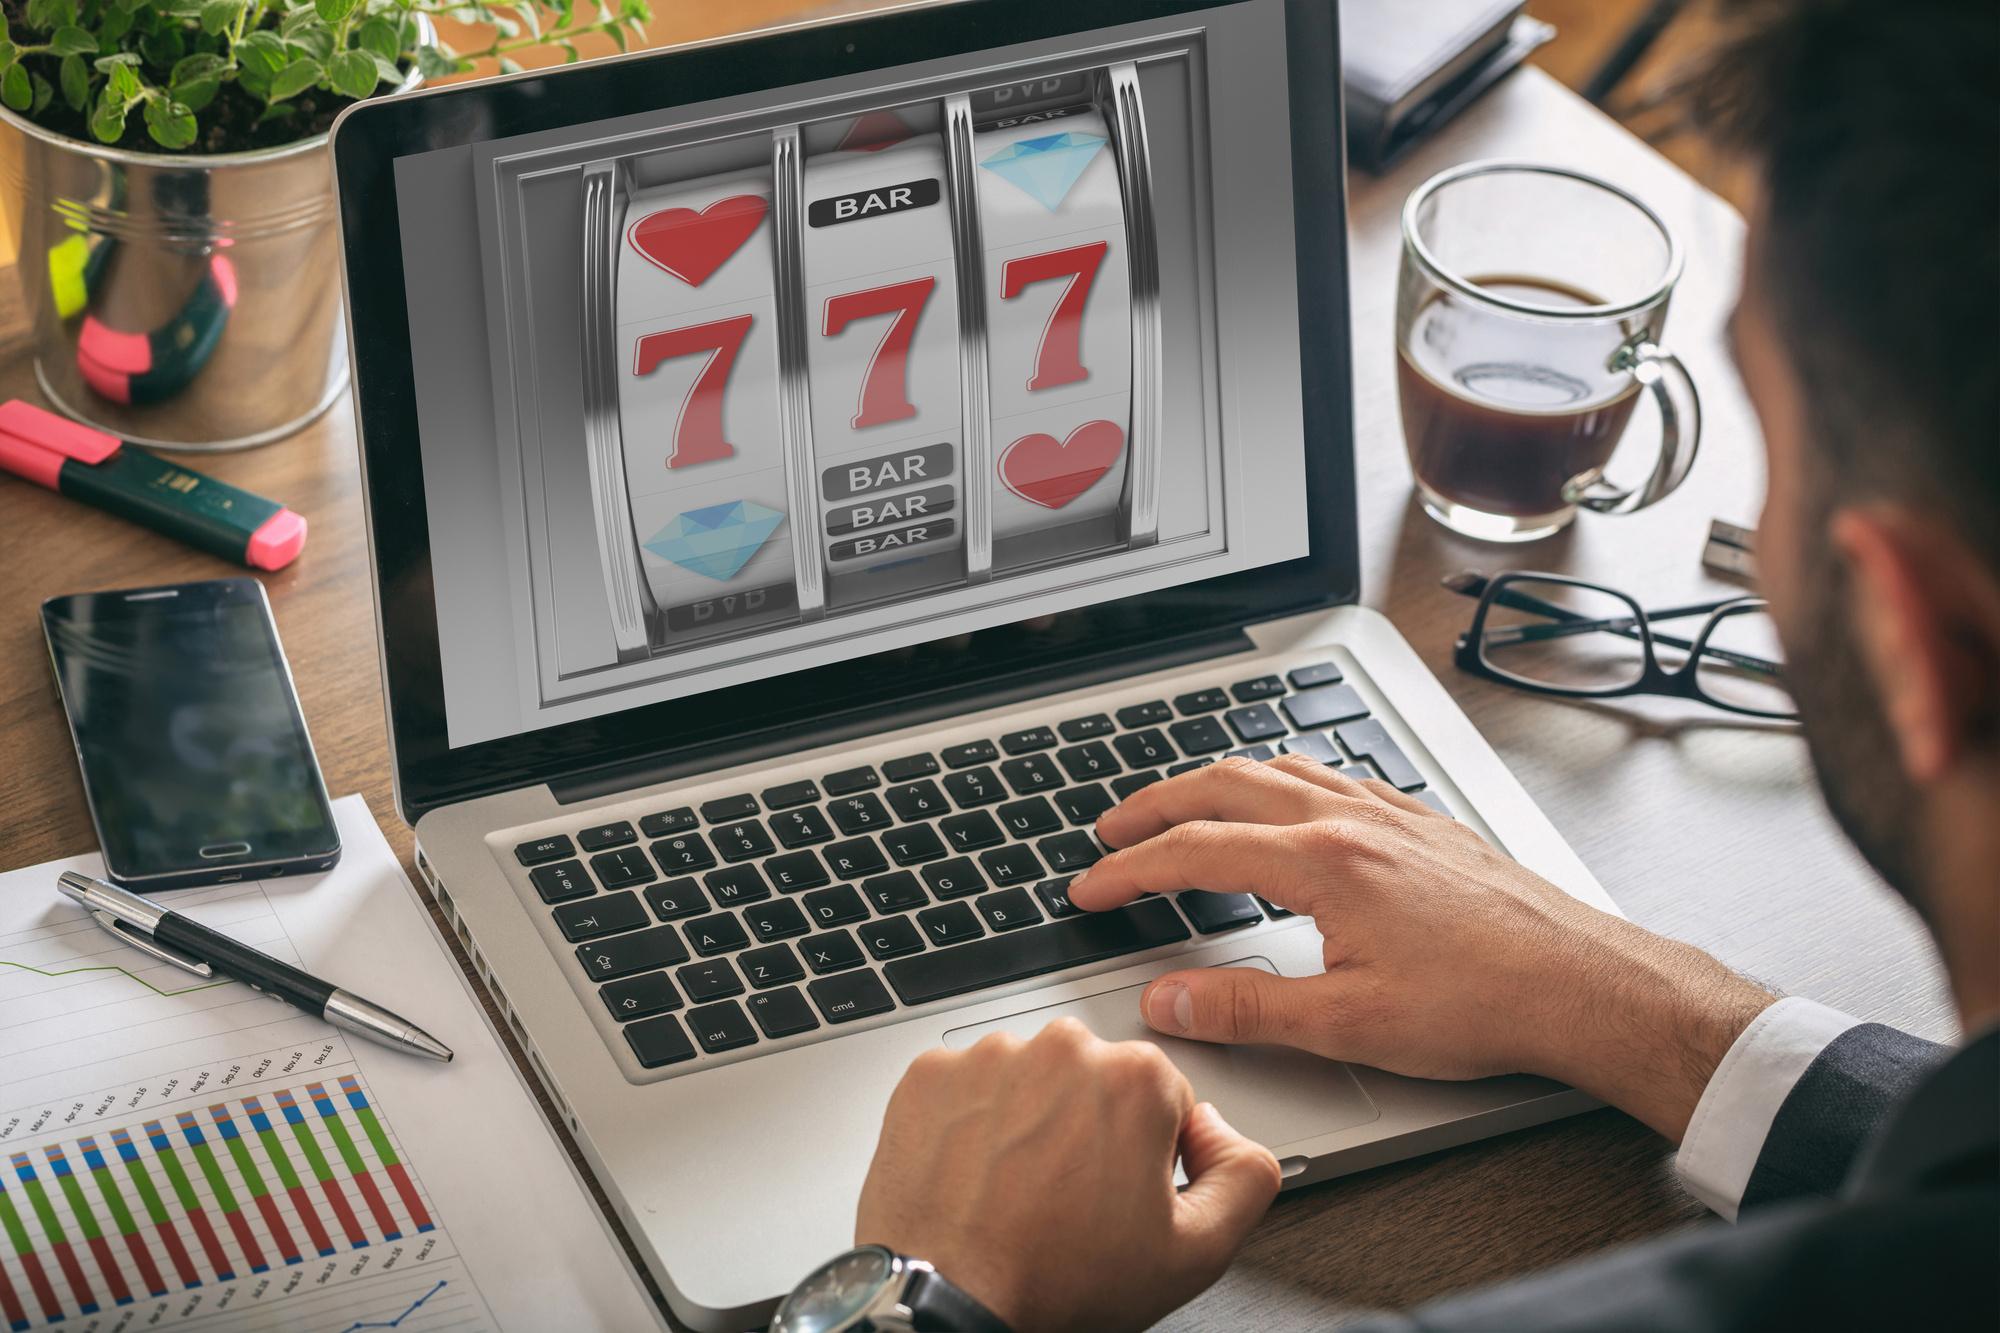 slot machine online máquinas tragaperras